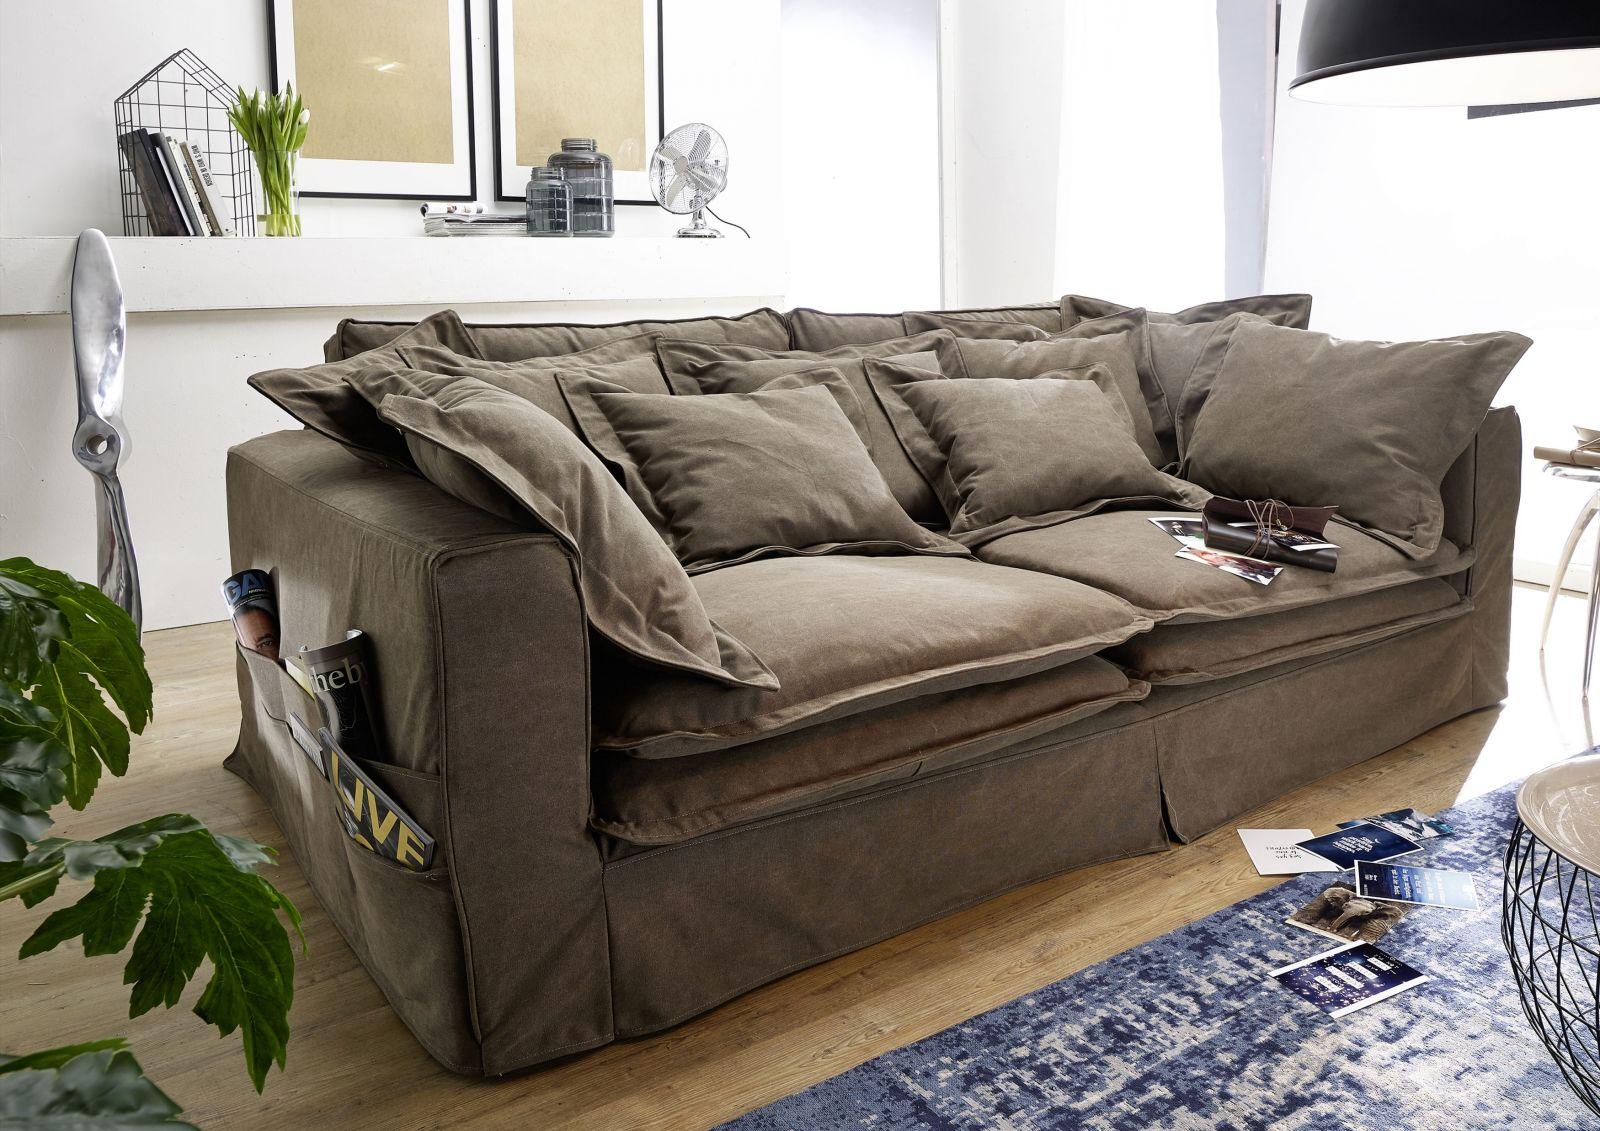 Full Size of Big Sofa Kolonialstil Xxl Couch L Form Afrika Sessel Sitzkissen Otto Mit Ottomane Gebraucht Braun Hawana Iii Im Schlaffunktion Echtleder Rot Kaufen Sofas Sofa Big Sofa Kolonialstil